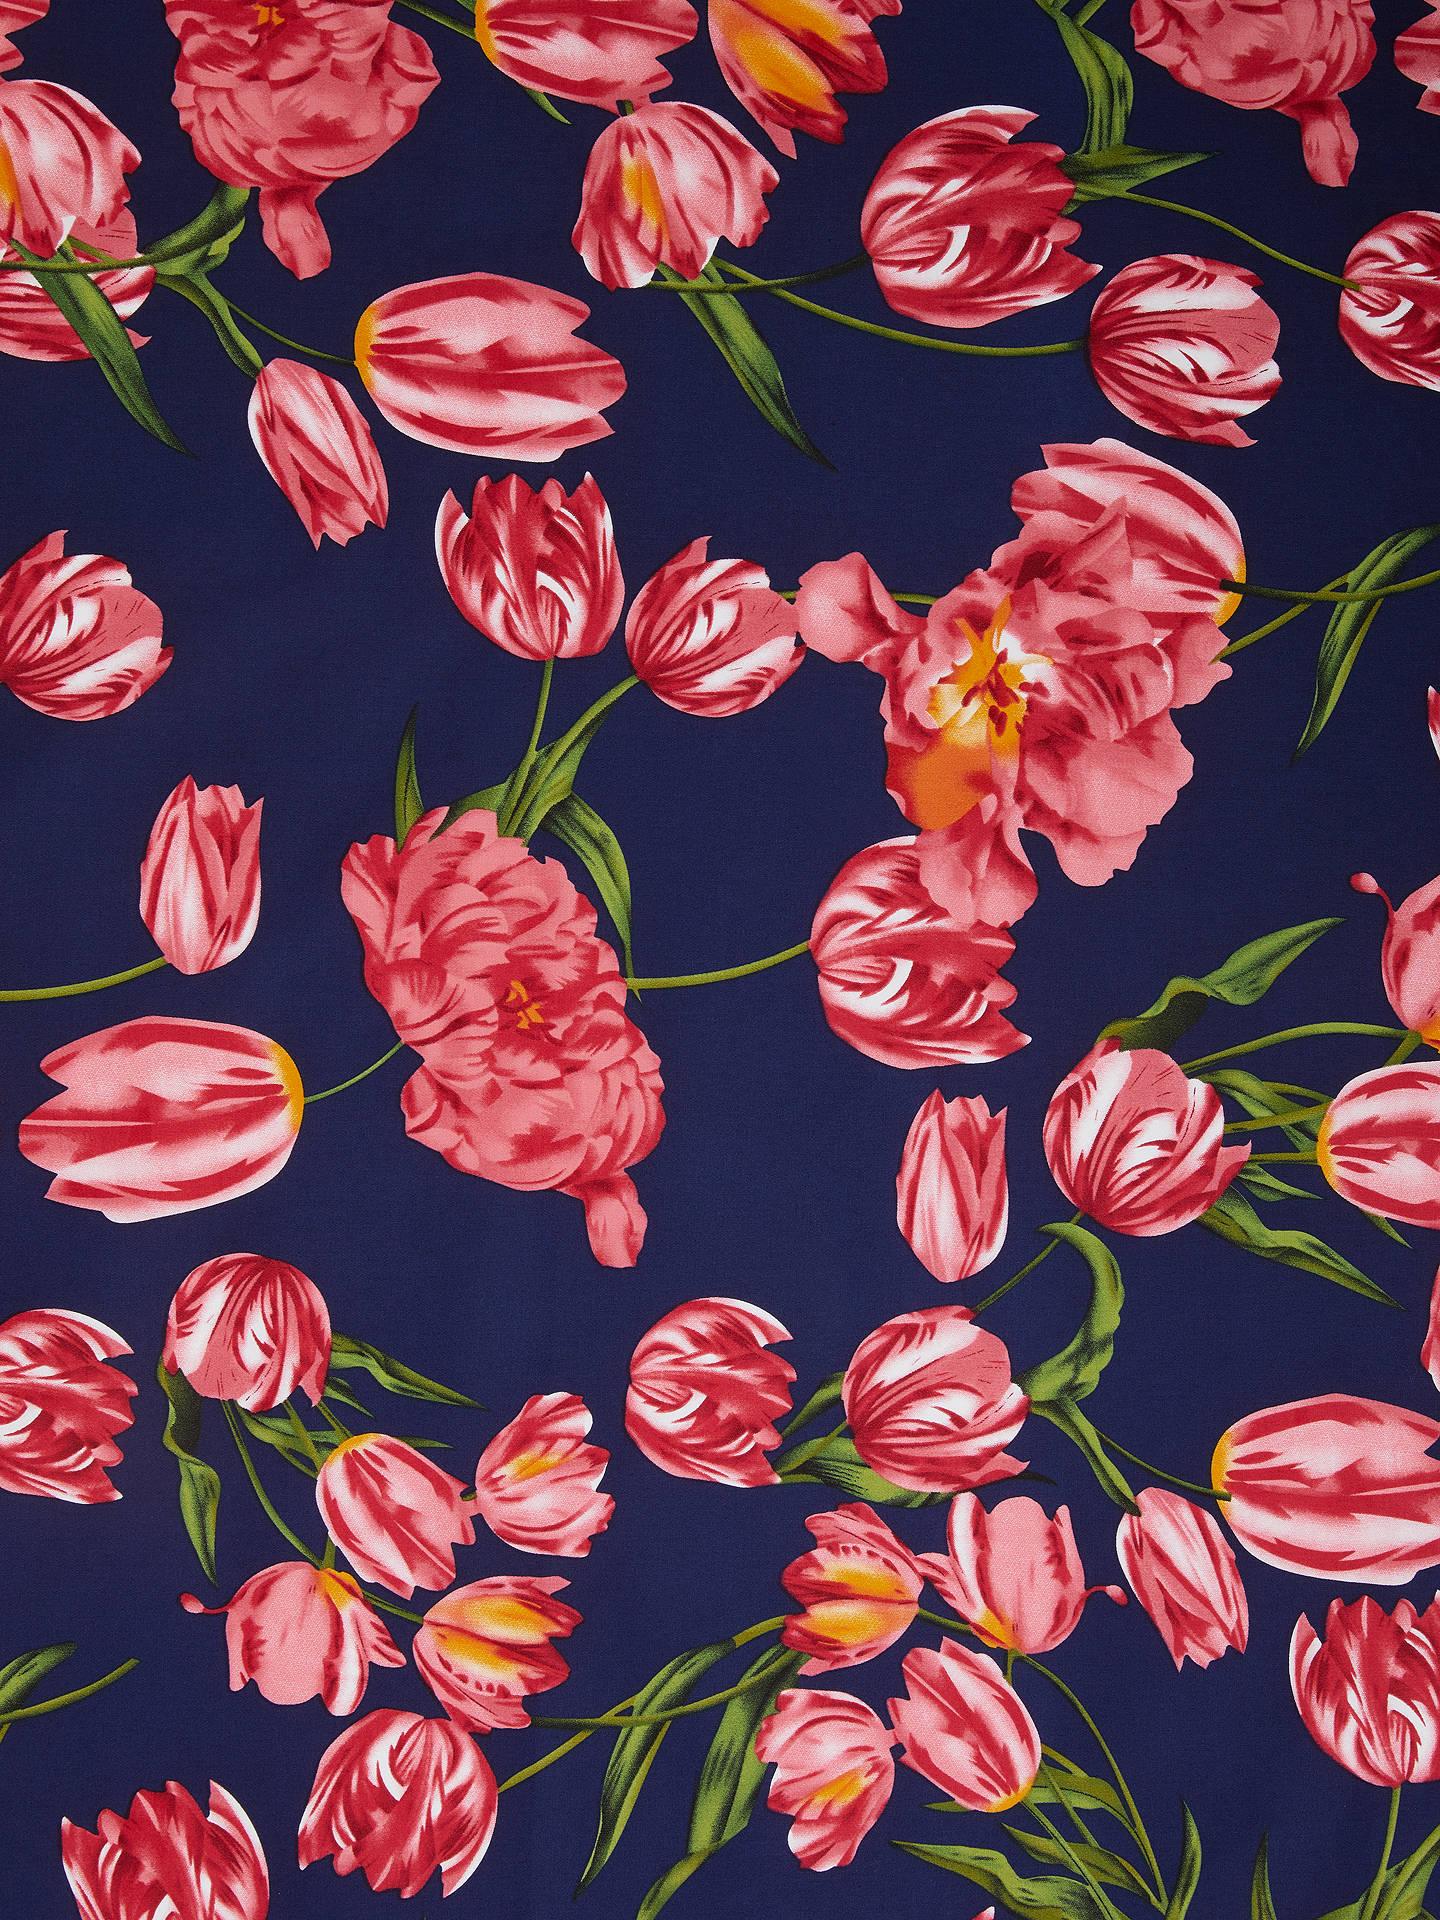 bdc23b2ae74b6 Buy Viscount Textiles Pink Tulips Print Fabric, Navy Online at  johnlewis.com ...